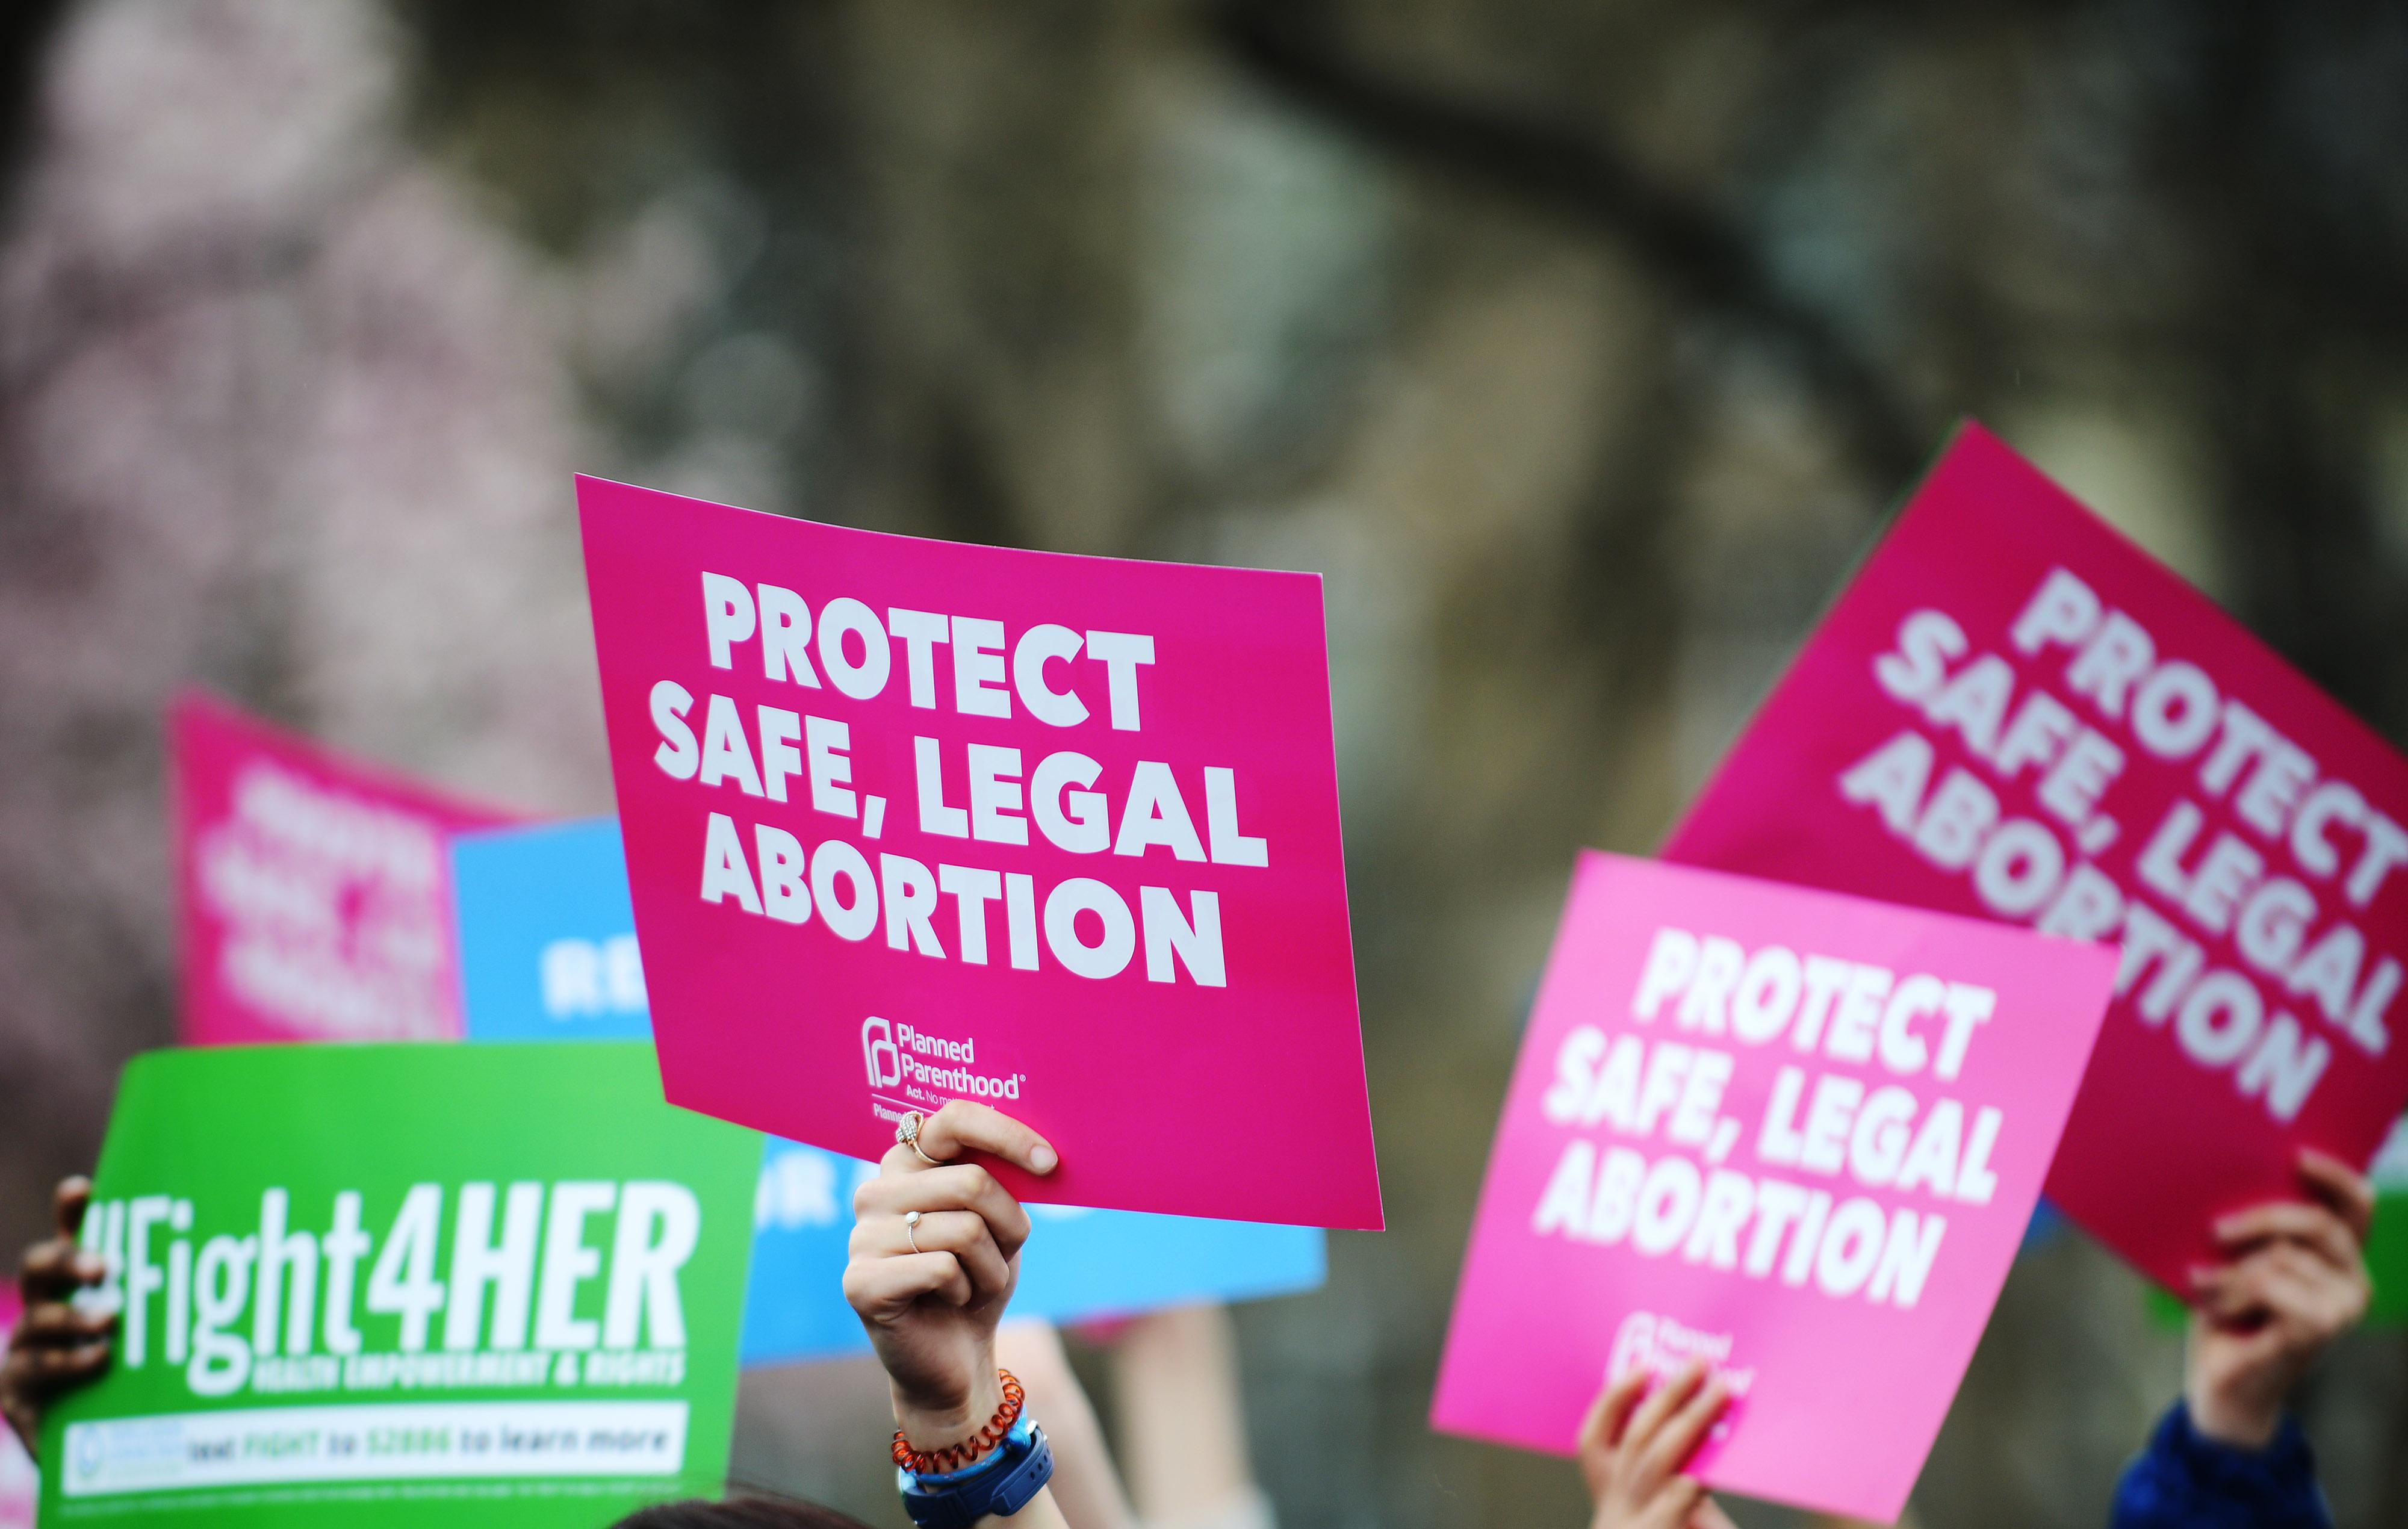 How billionaire philanthropy provides reproductive health care when politicians won't